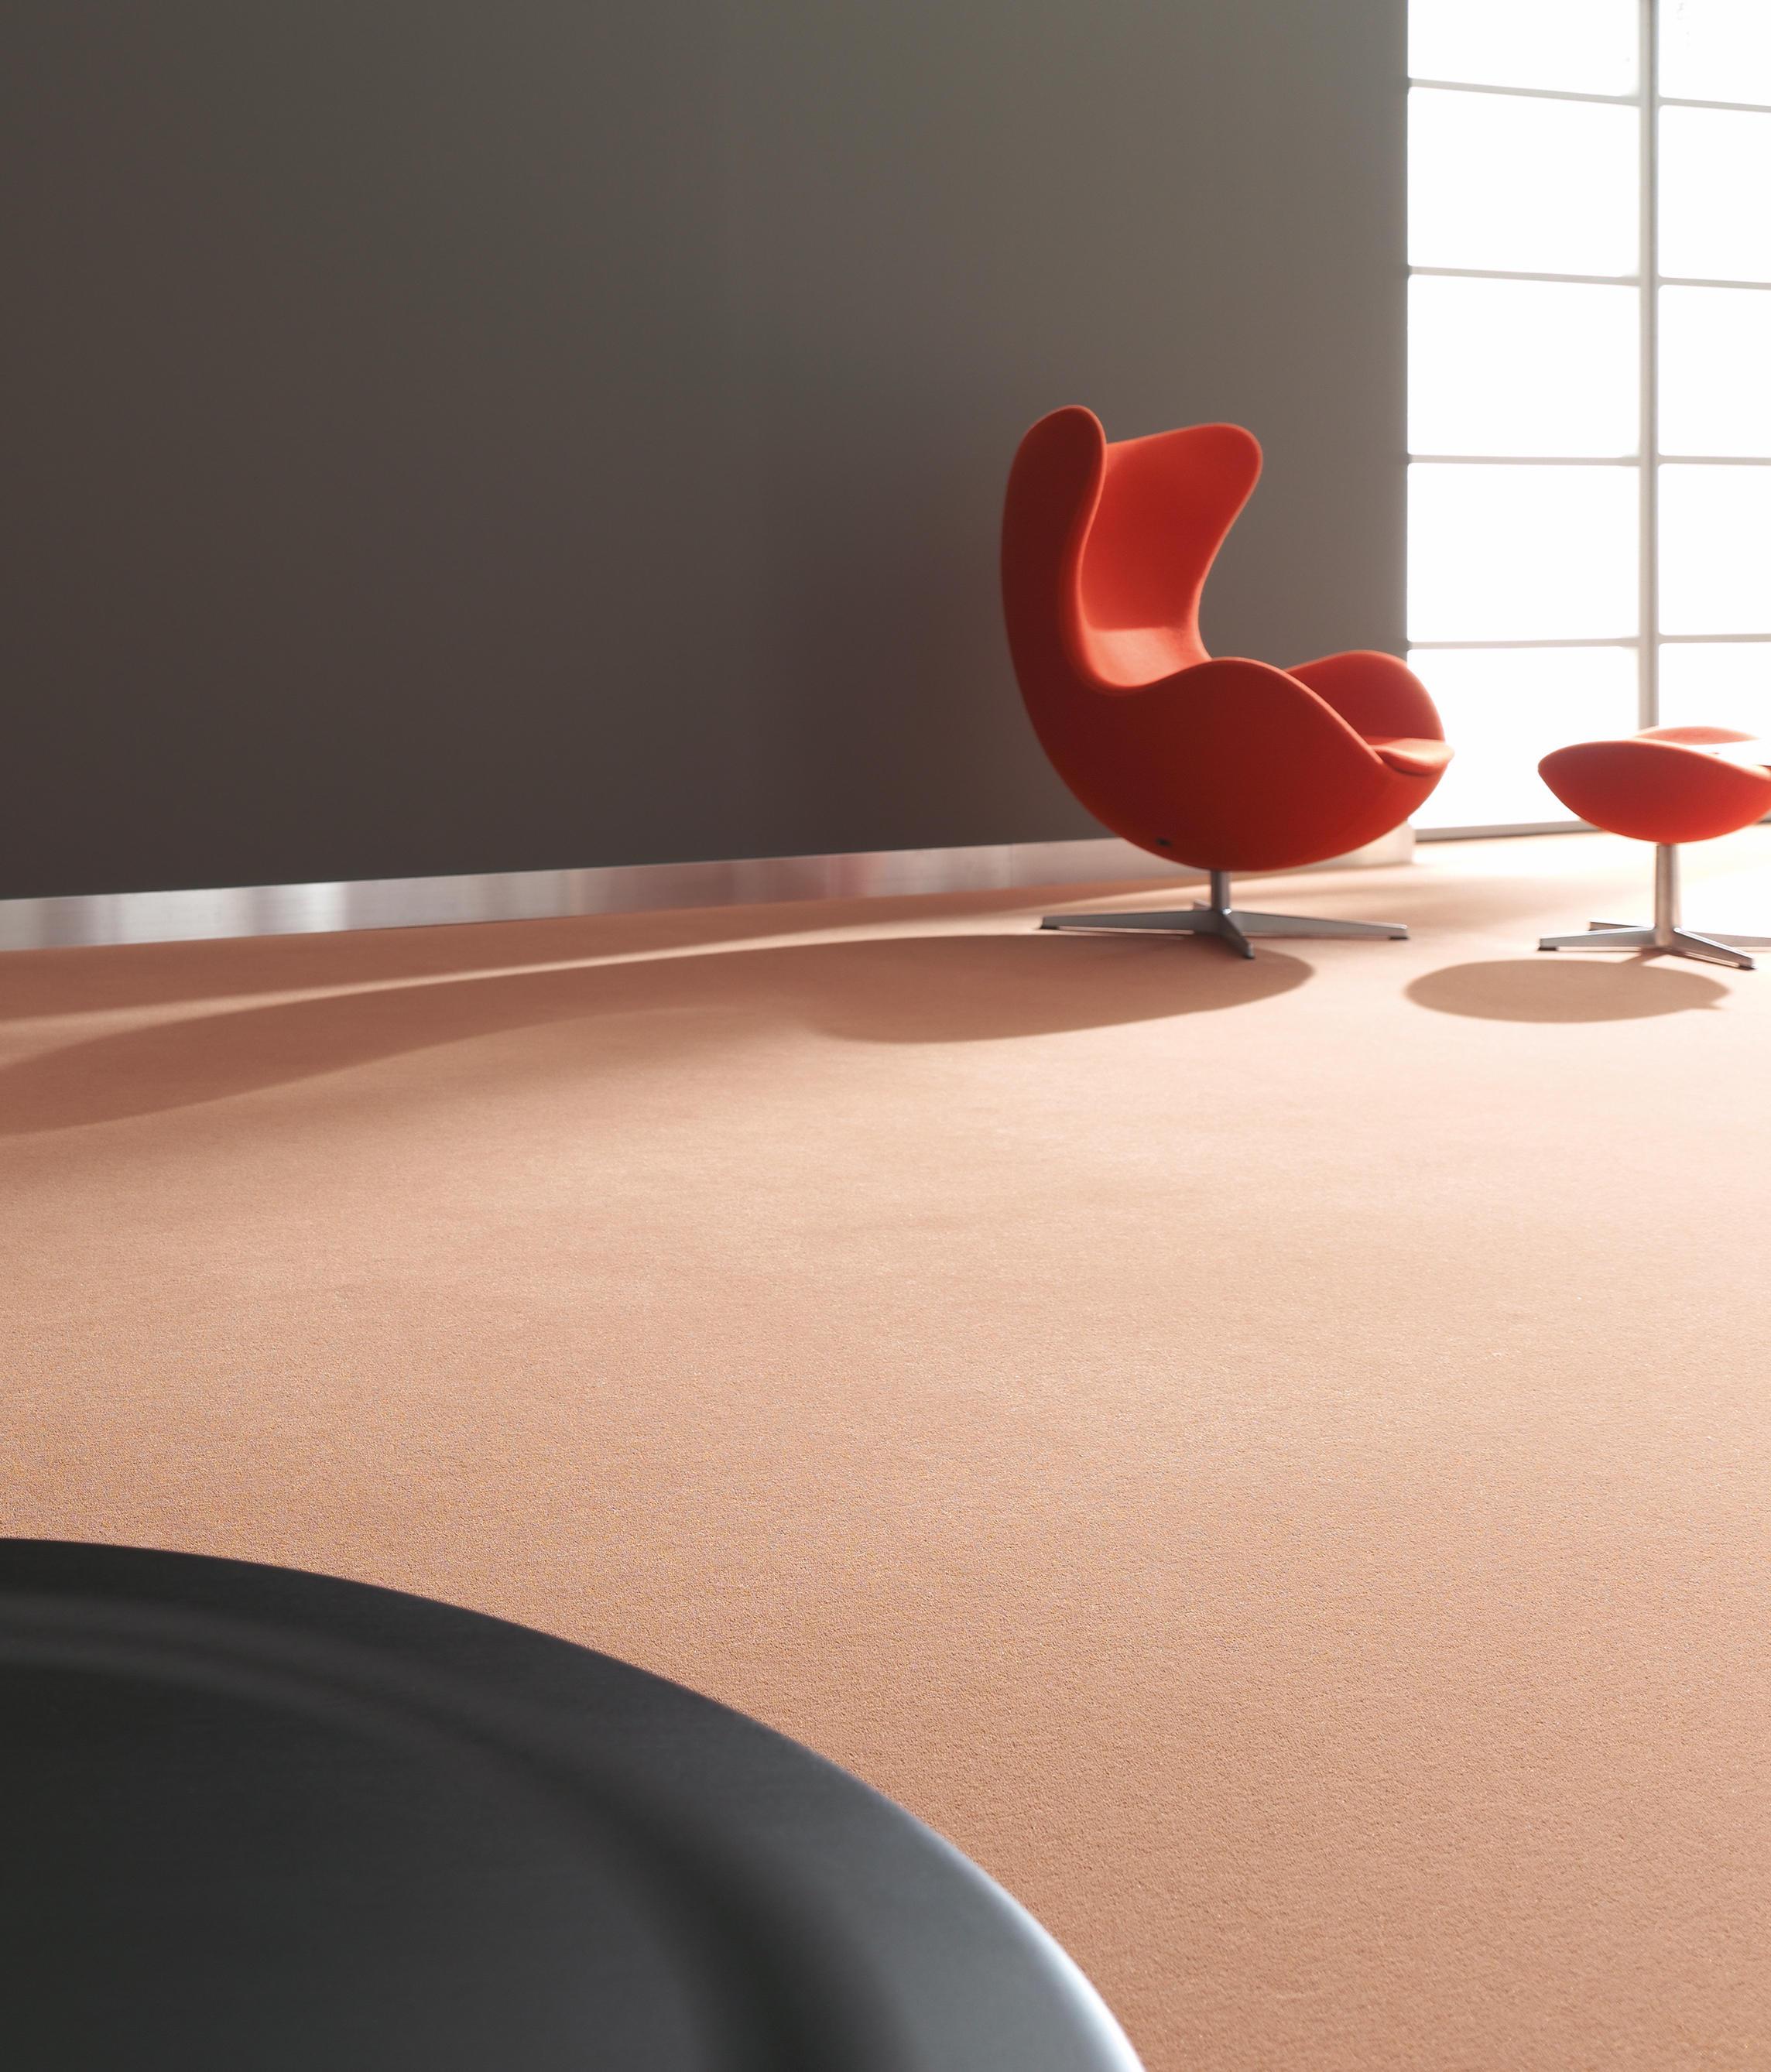 projection 232e auslegware von vorwerk architonic. Black Bedroom Furniture Sets. Home Design Ideas